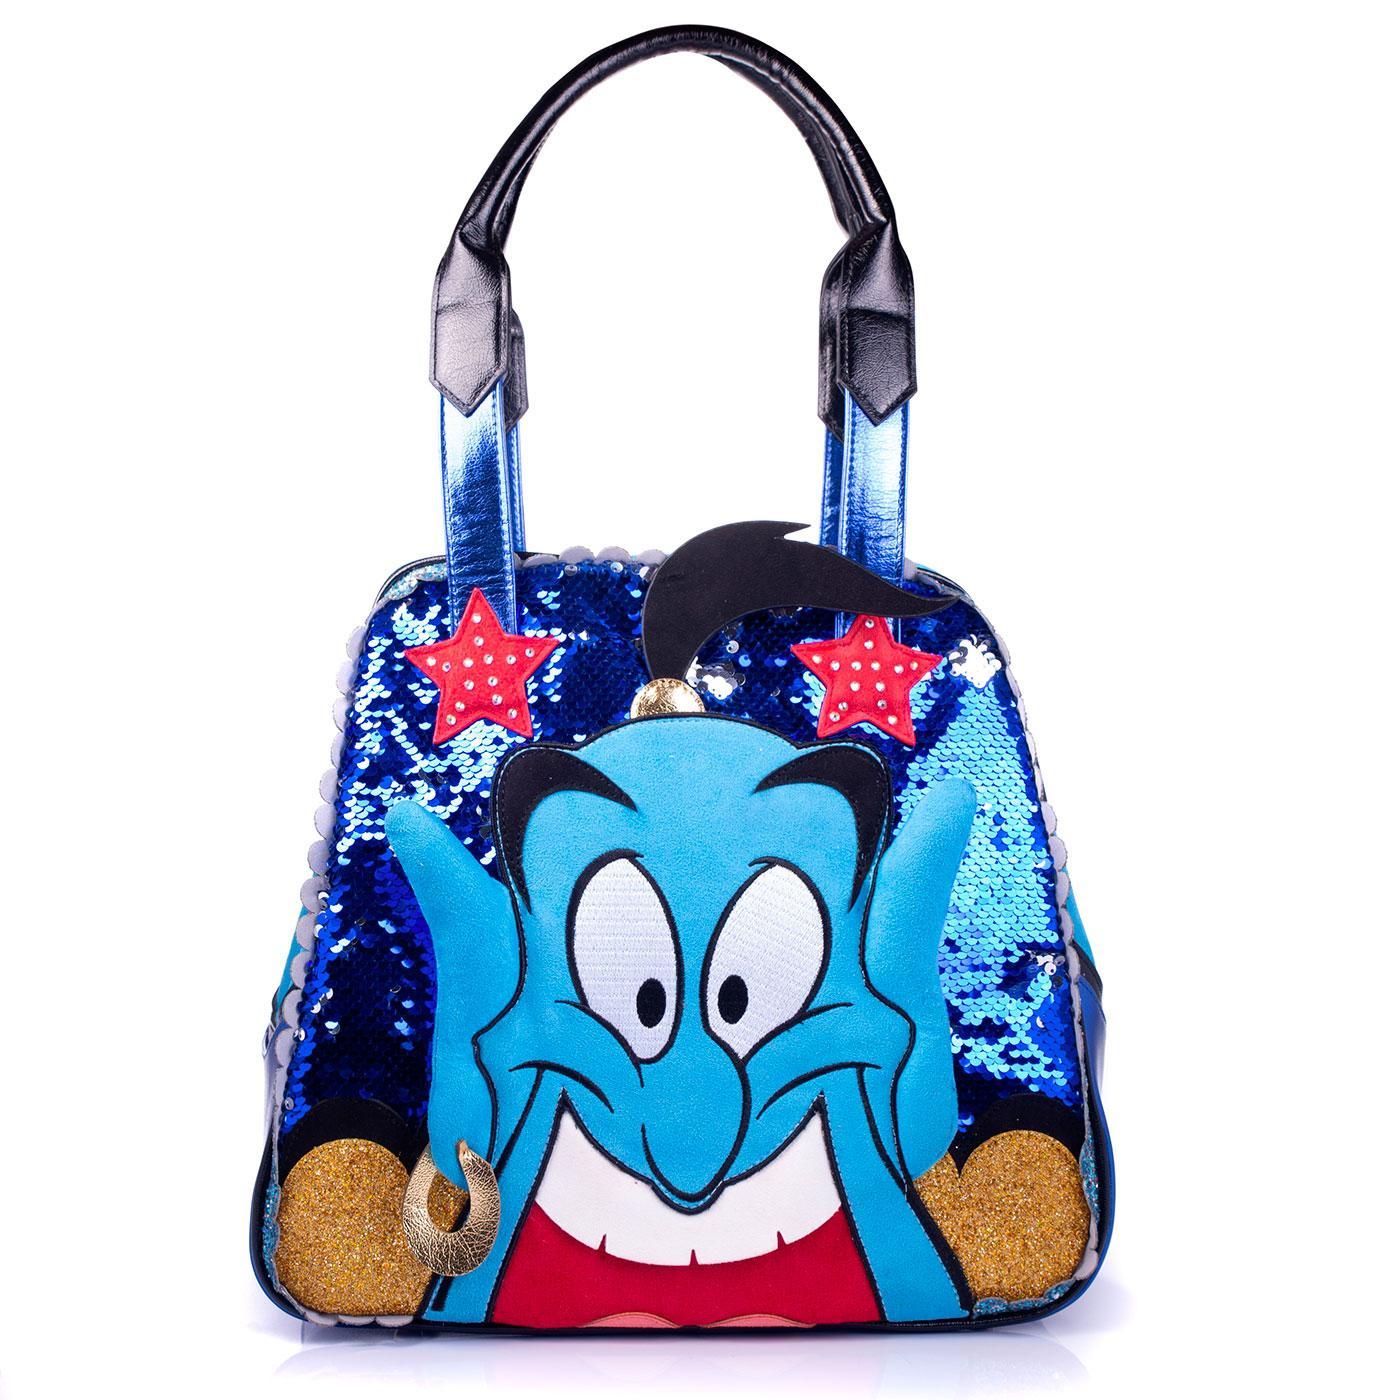 Genie IRREGULAR CHOICE Disney's Aladdin Handbag